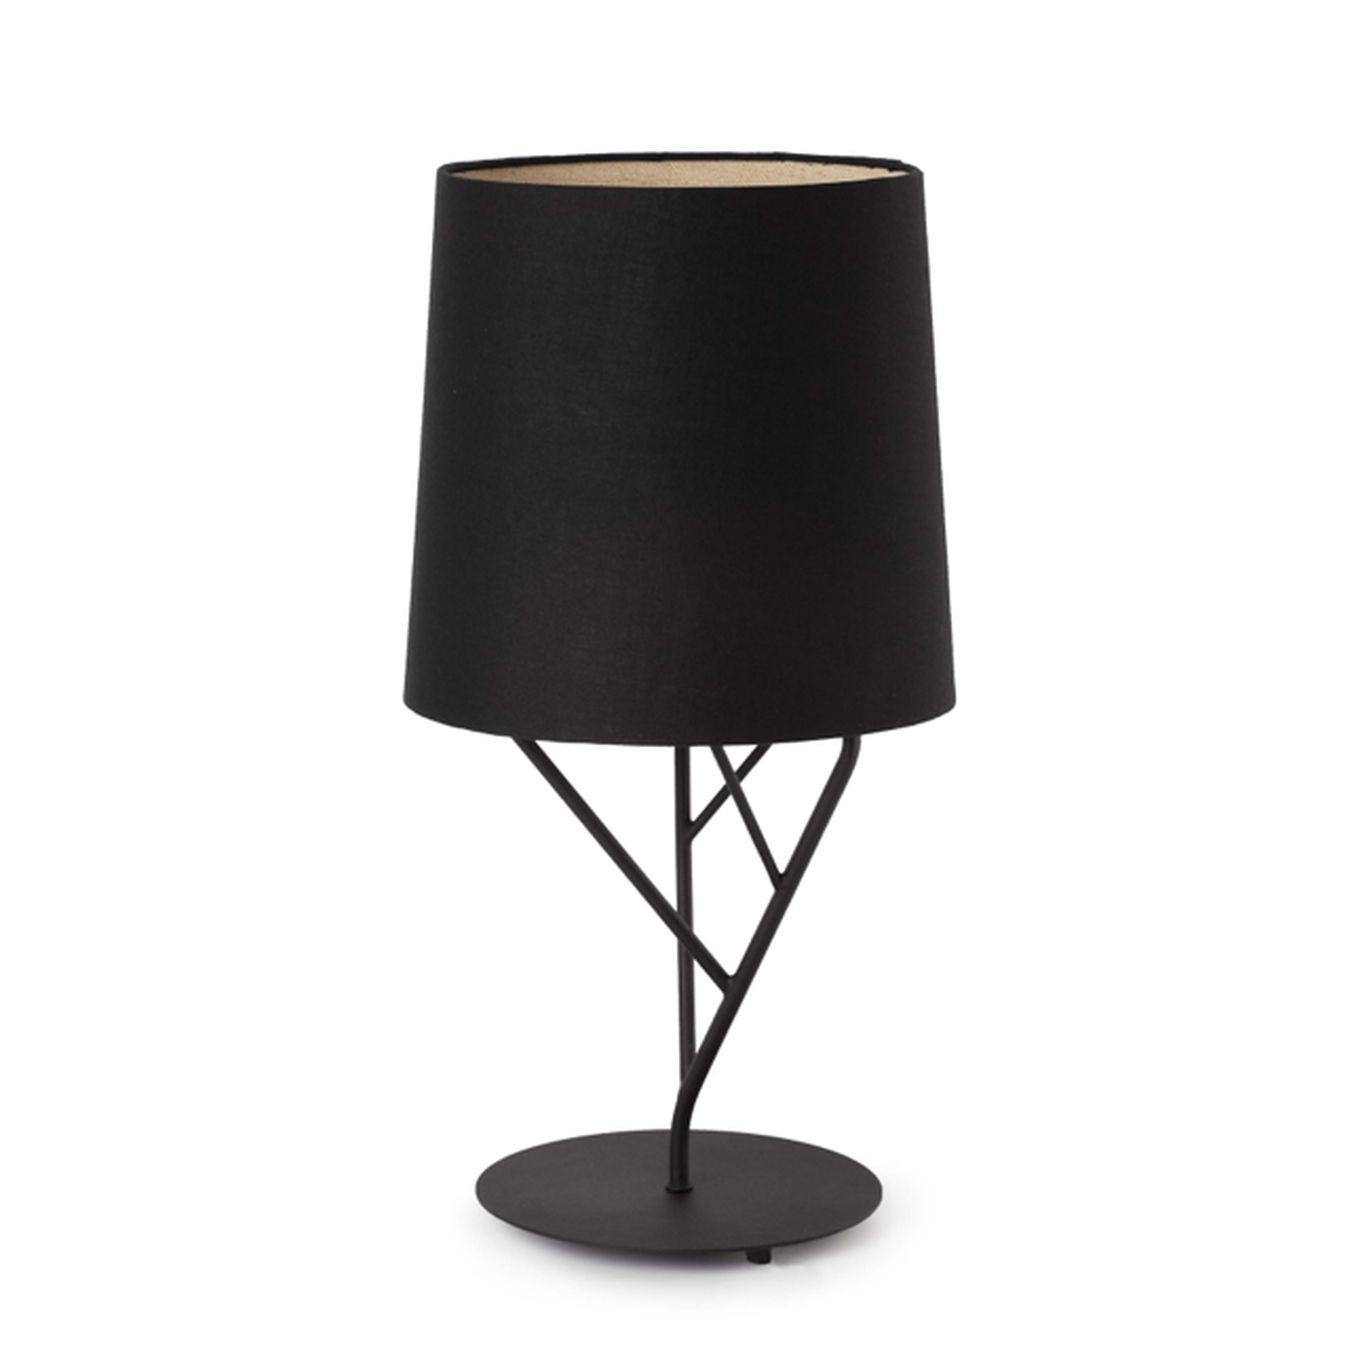 Comprar l mpara de mesa negra dise o rbol comprar l mparas de mesa modernas de dise o - Pantallas de lamparas de mesa ...